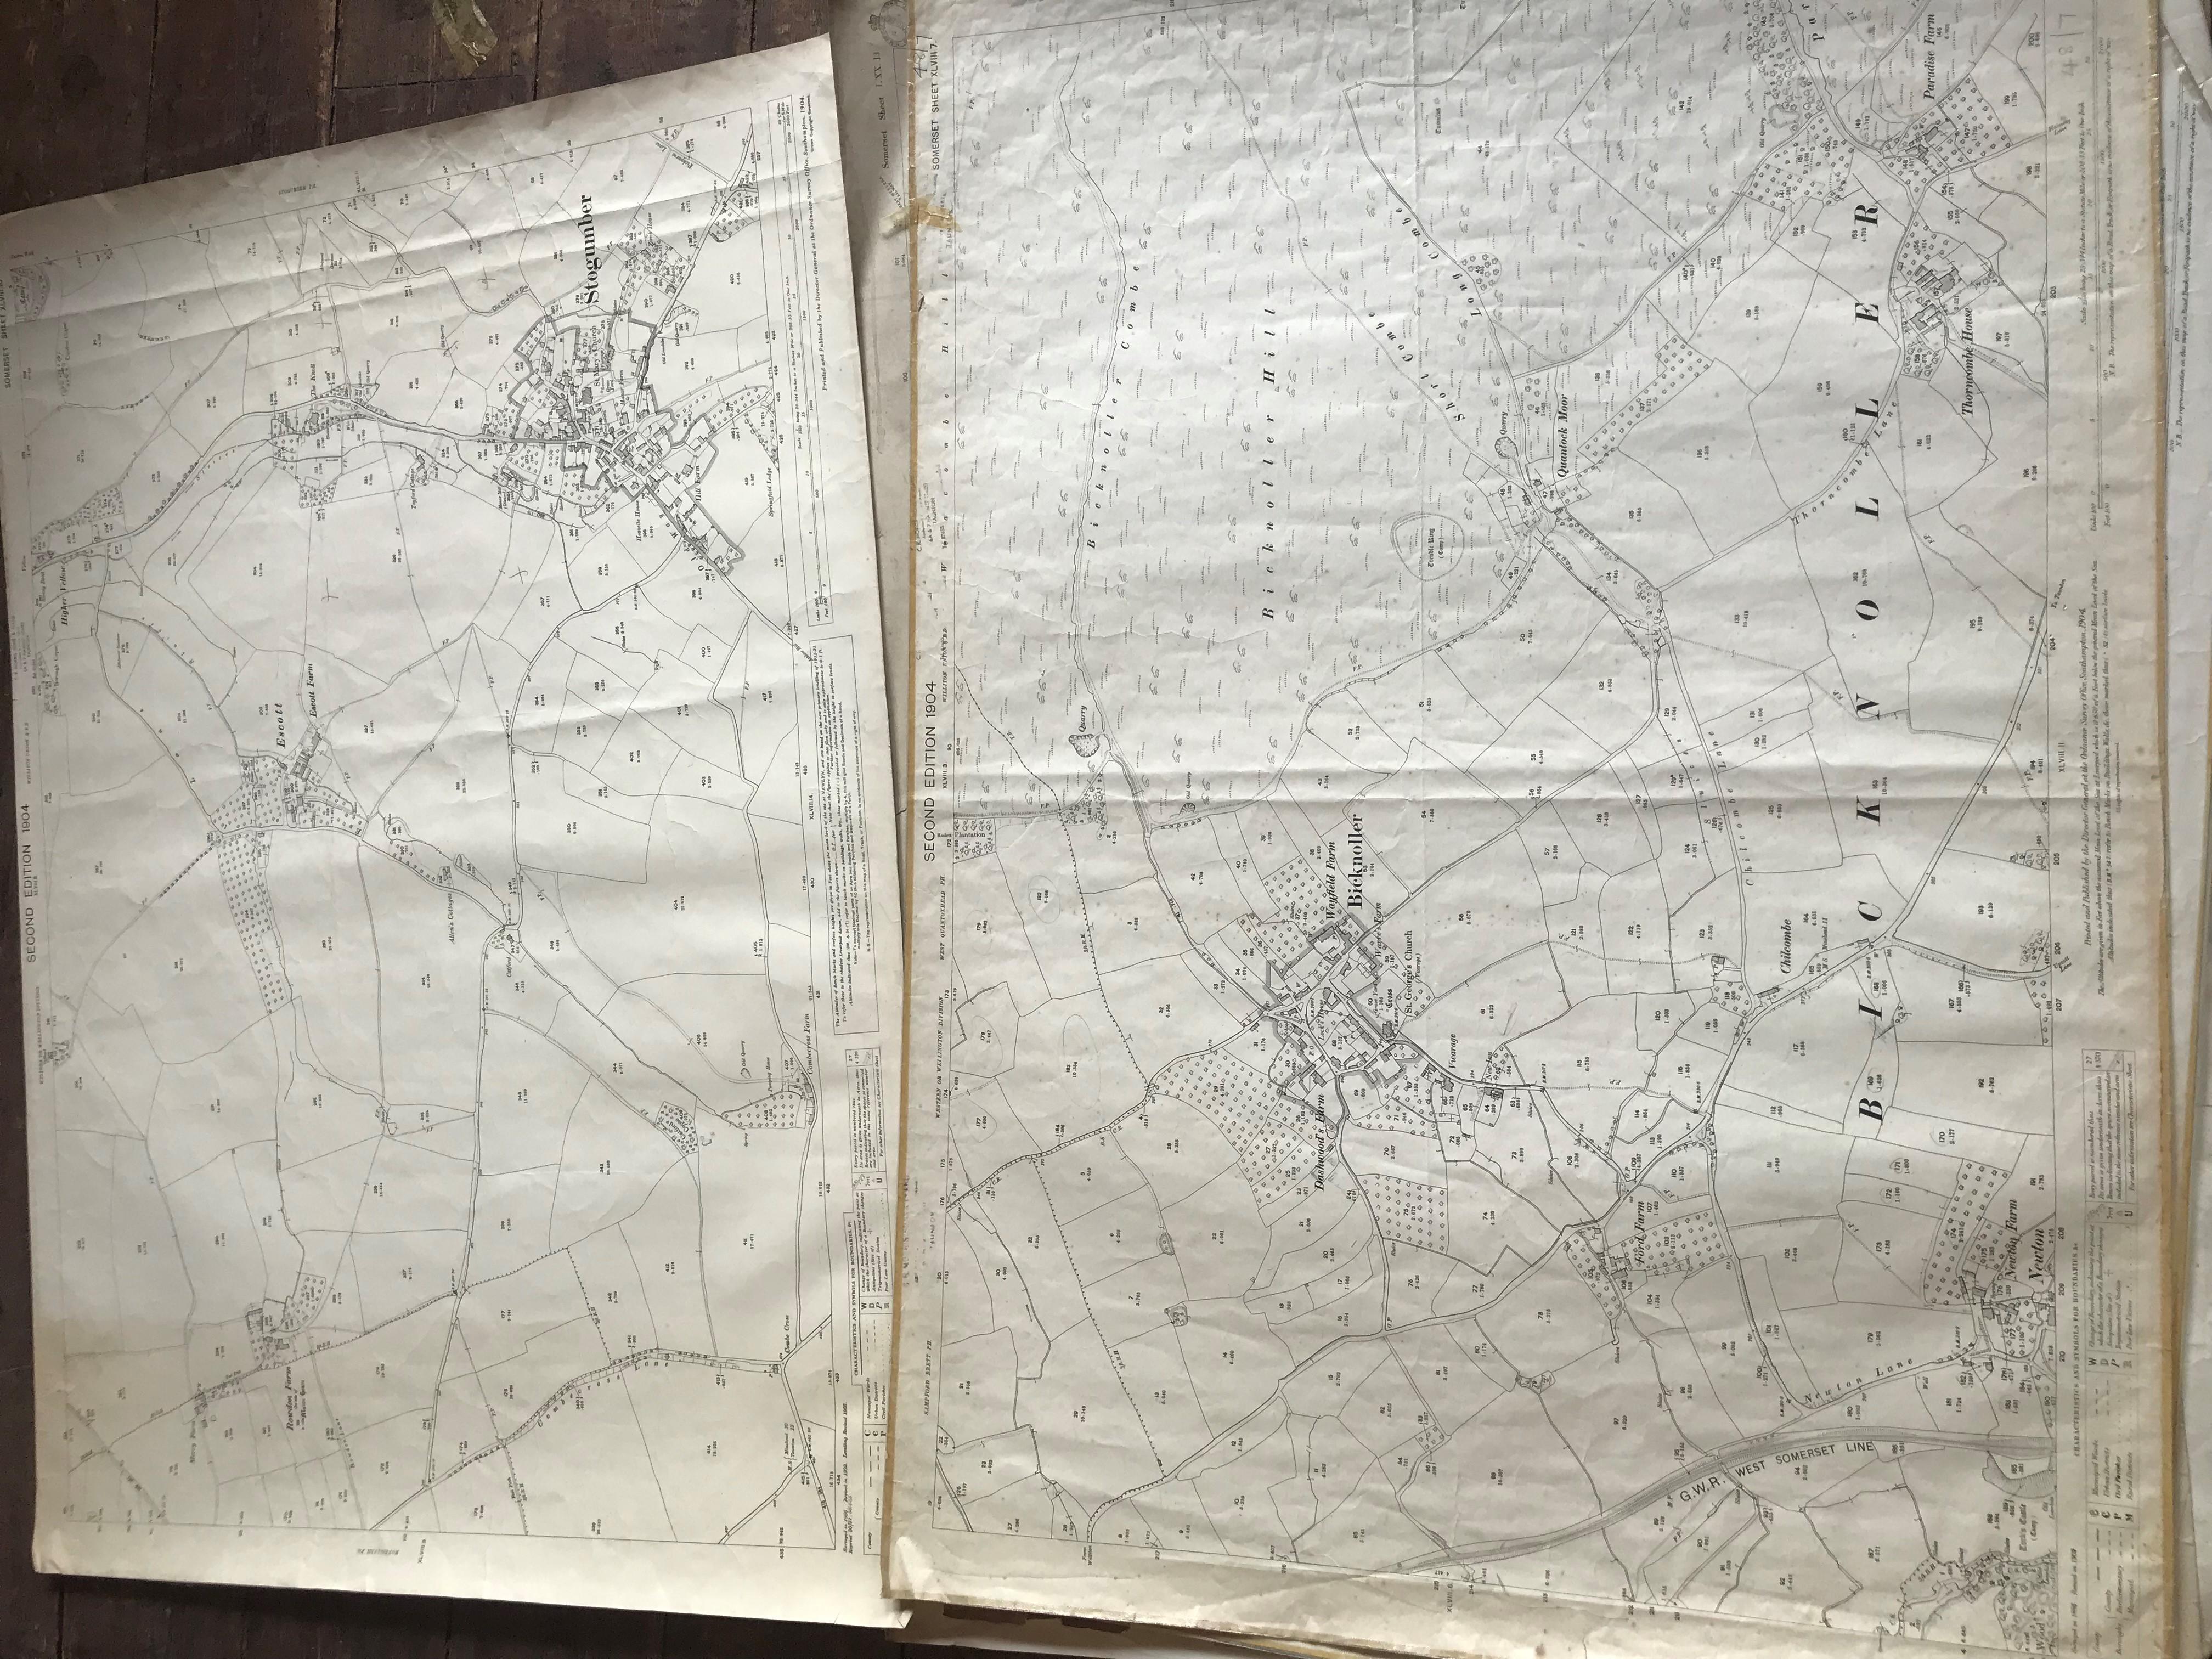 THIRTY 1:2500 ORDNANCE SURVEY MAPS featuring Chelston, Ham, Sampford Brett, Wellington, - Image 12 of 16